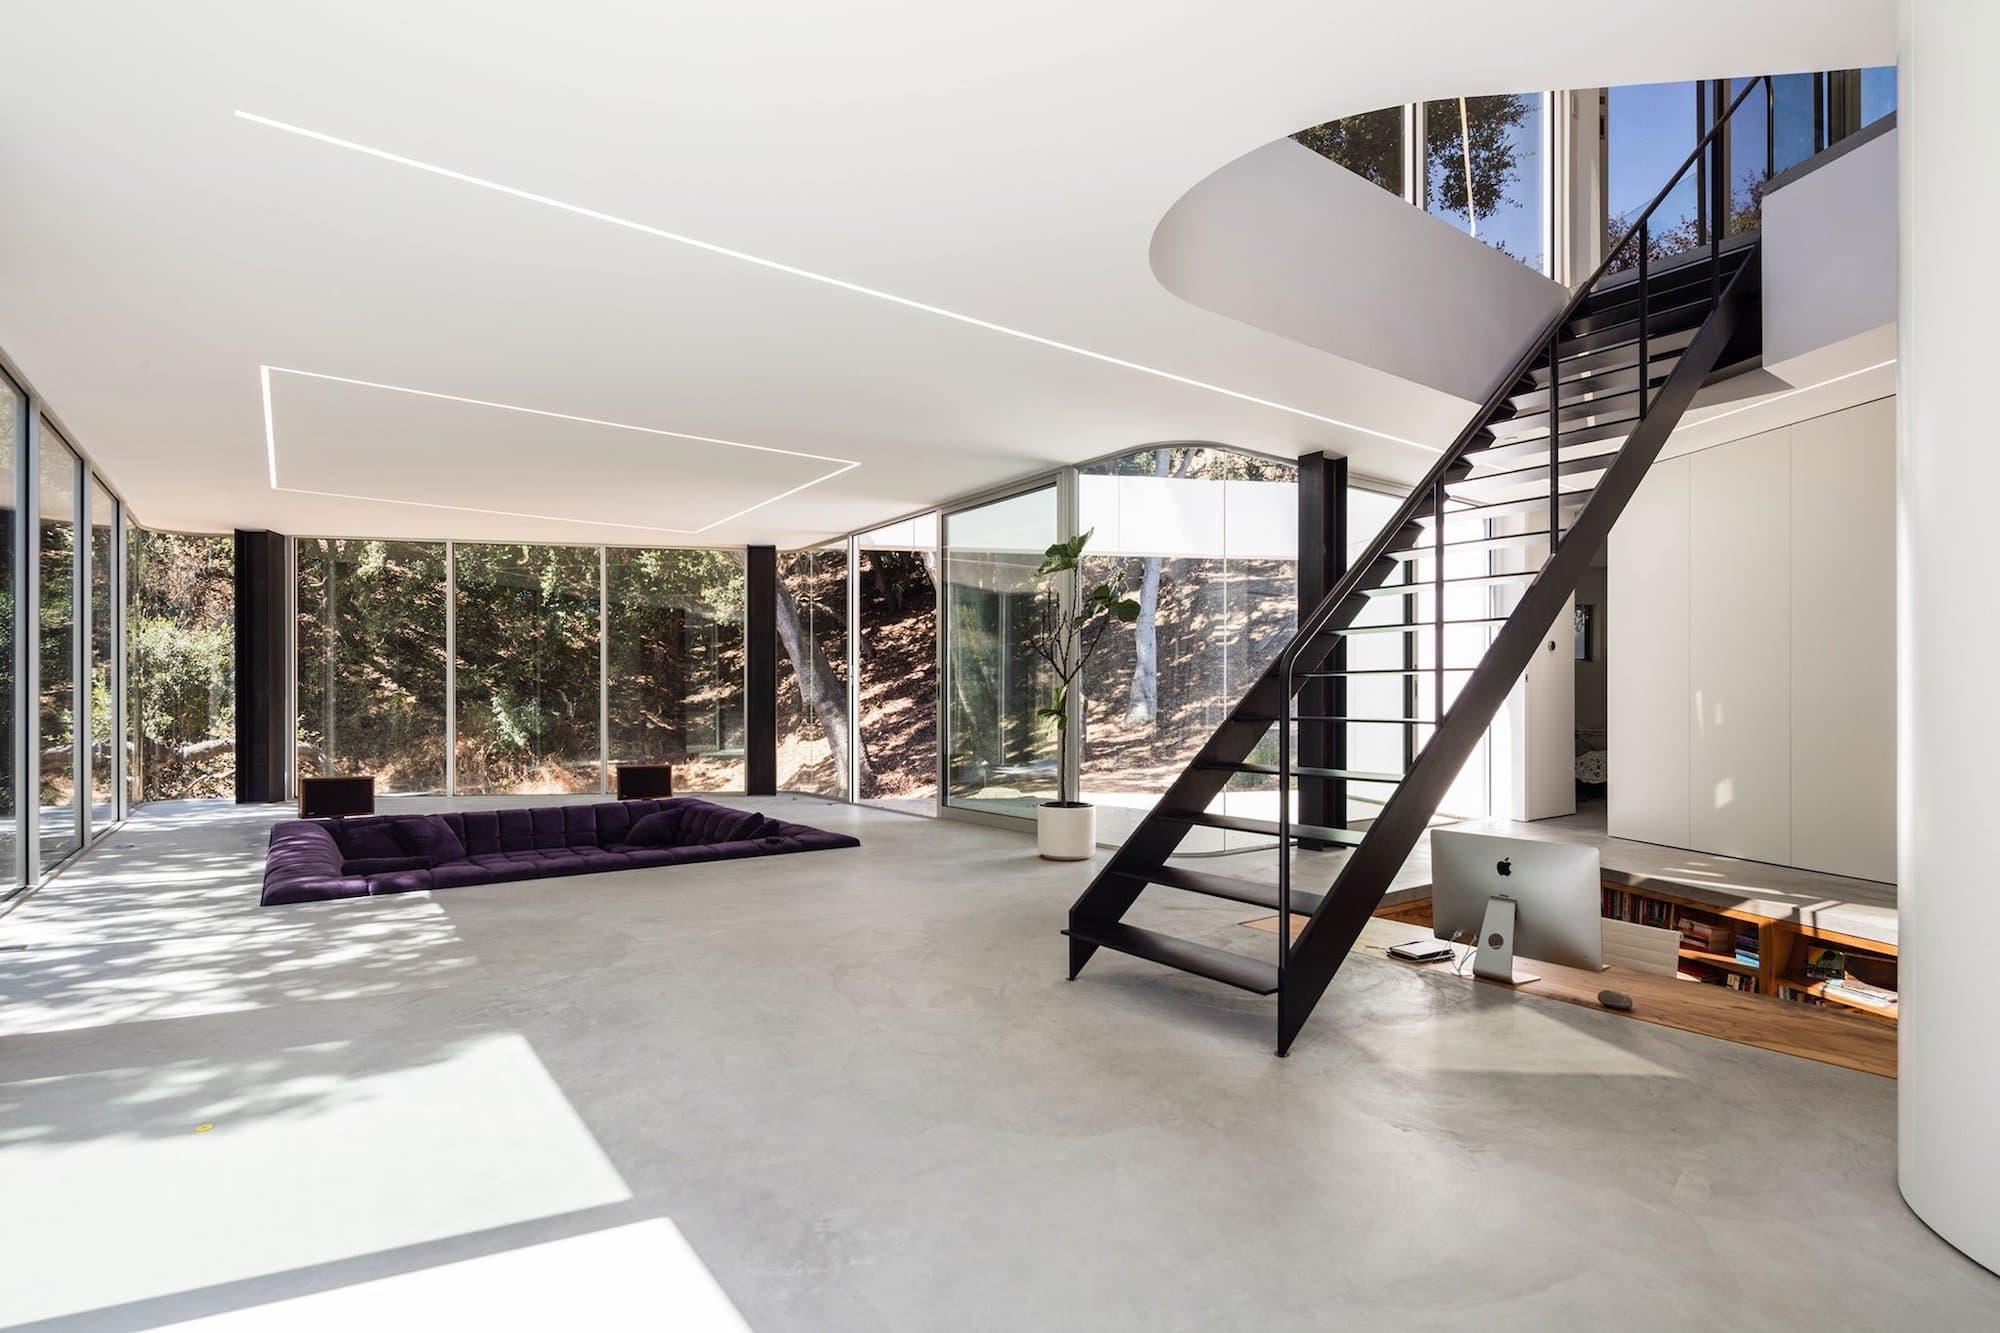 Licht ist Leben: Pam & Paul's House by Craig Steely Architecture 7